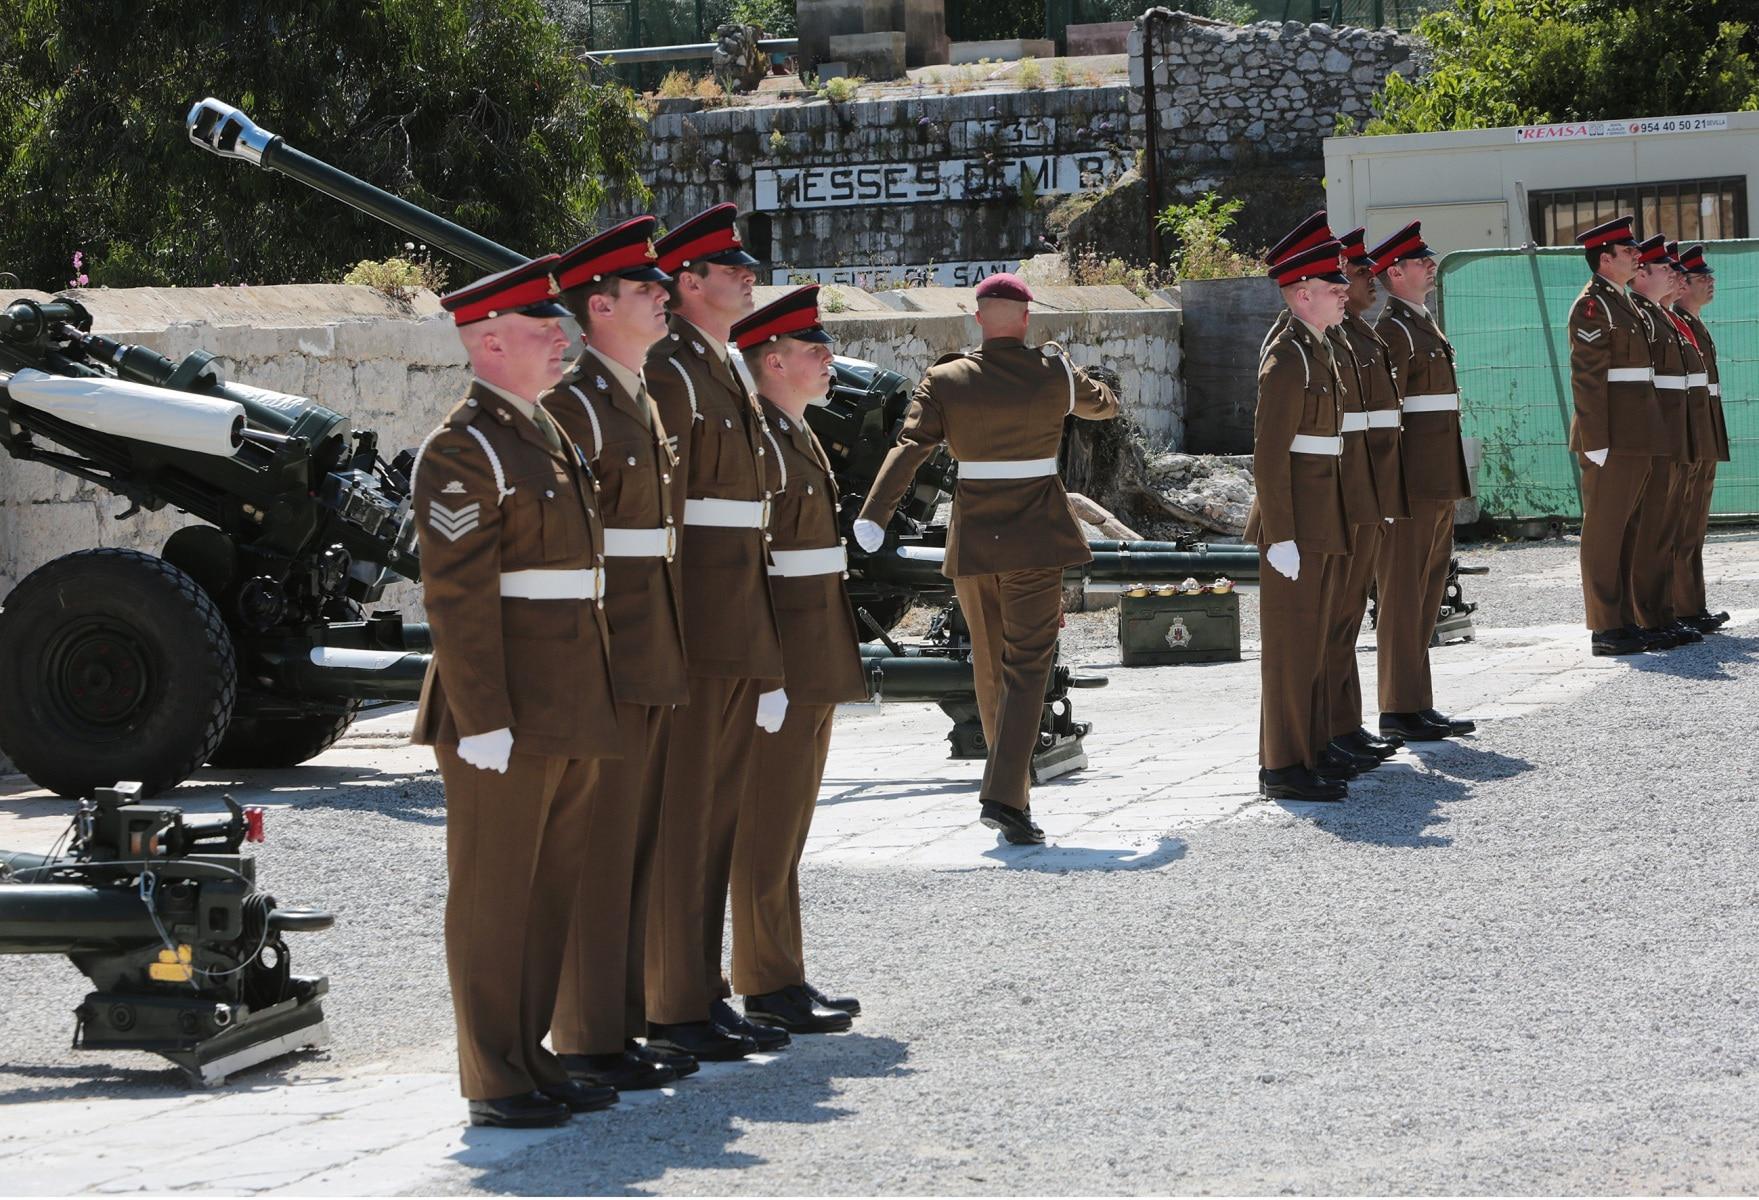 2-jun-2016-salvas-en-gibraltar-honor-al-aniversario-de-coronacin-de-la-reina_27383403676_o